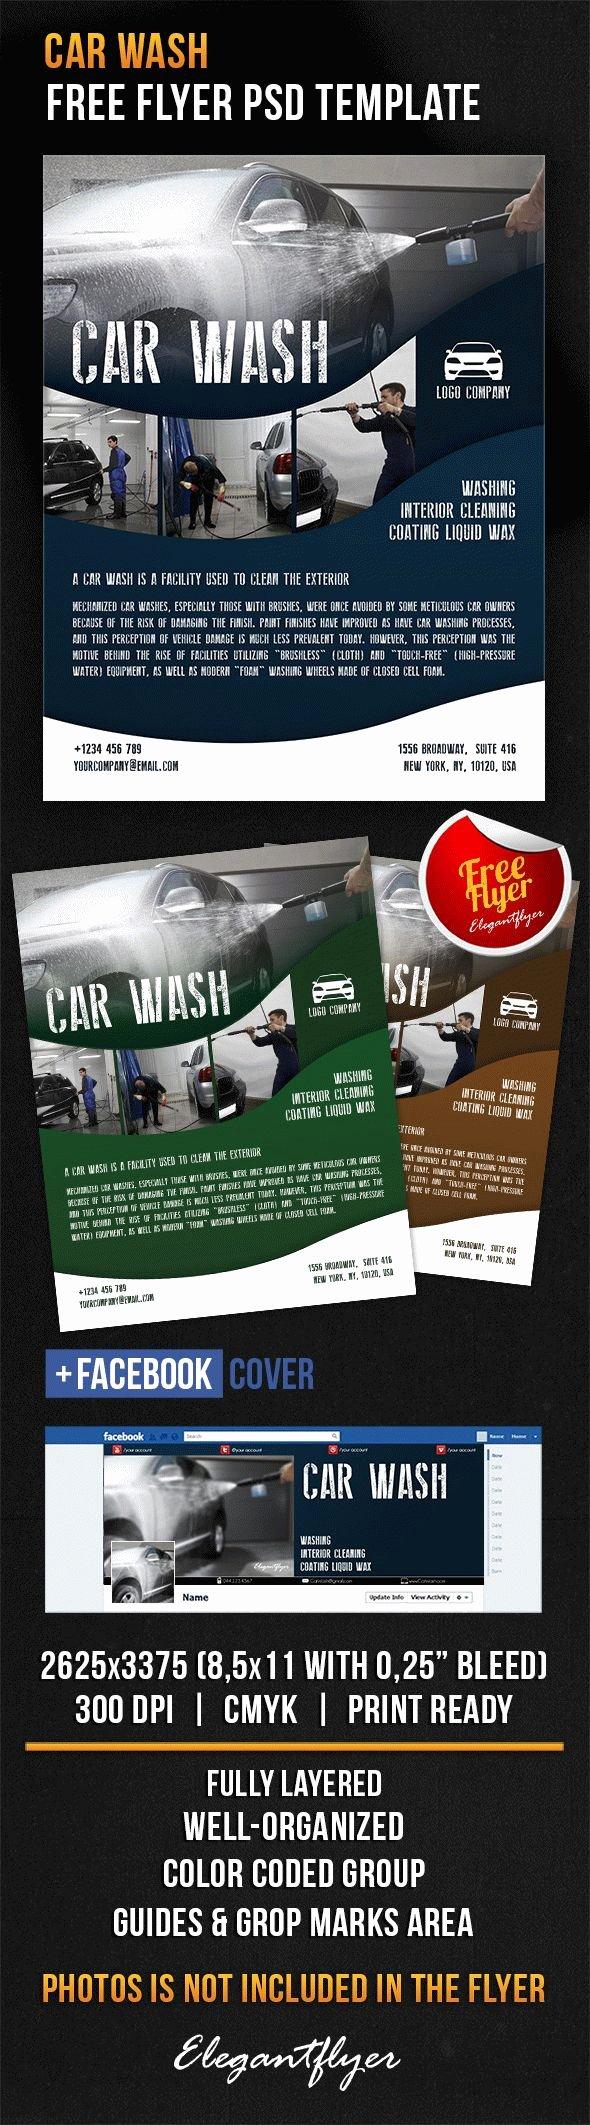 Car Wash – Free Flyer Psd Template – by Elegantflyer